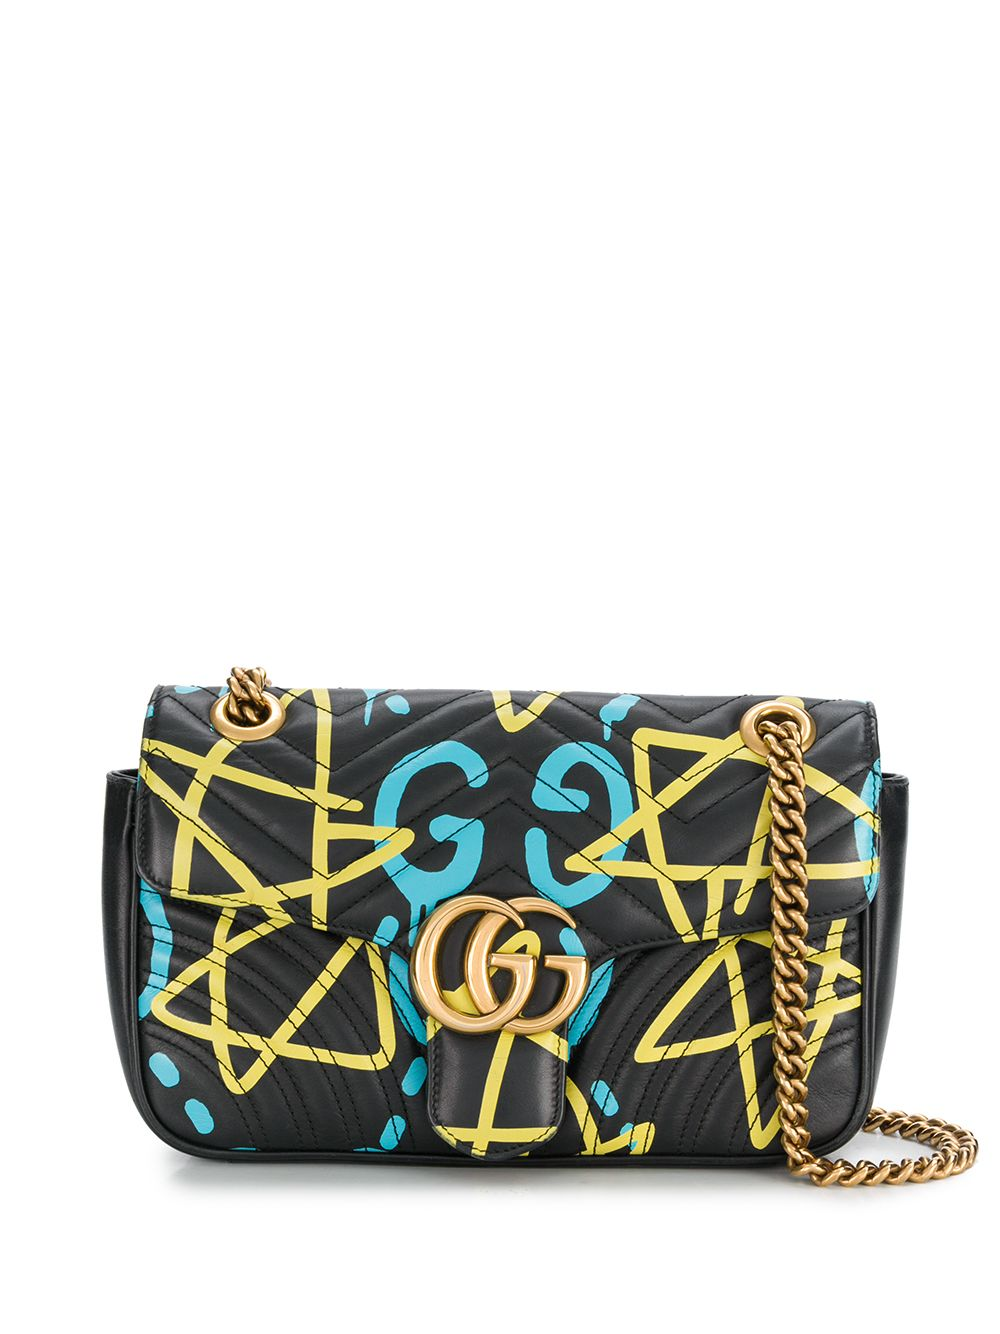 Gucci Star Print Bag